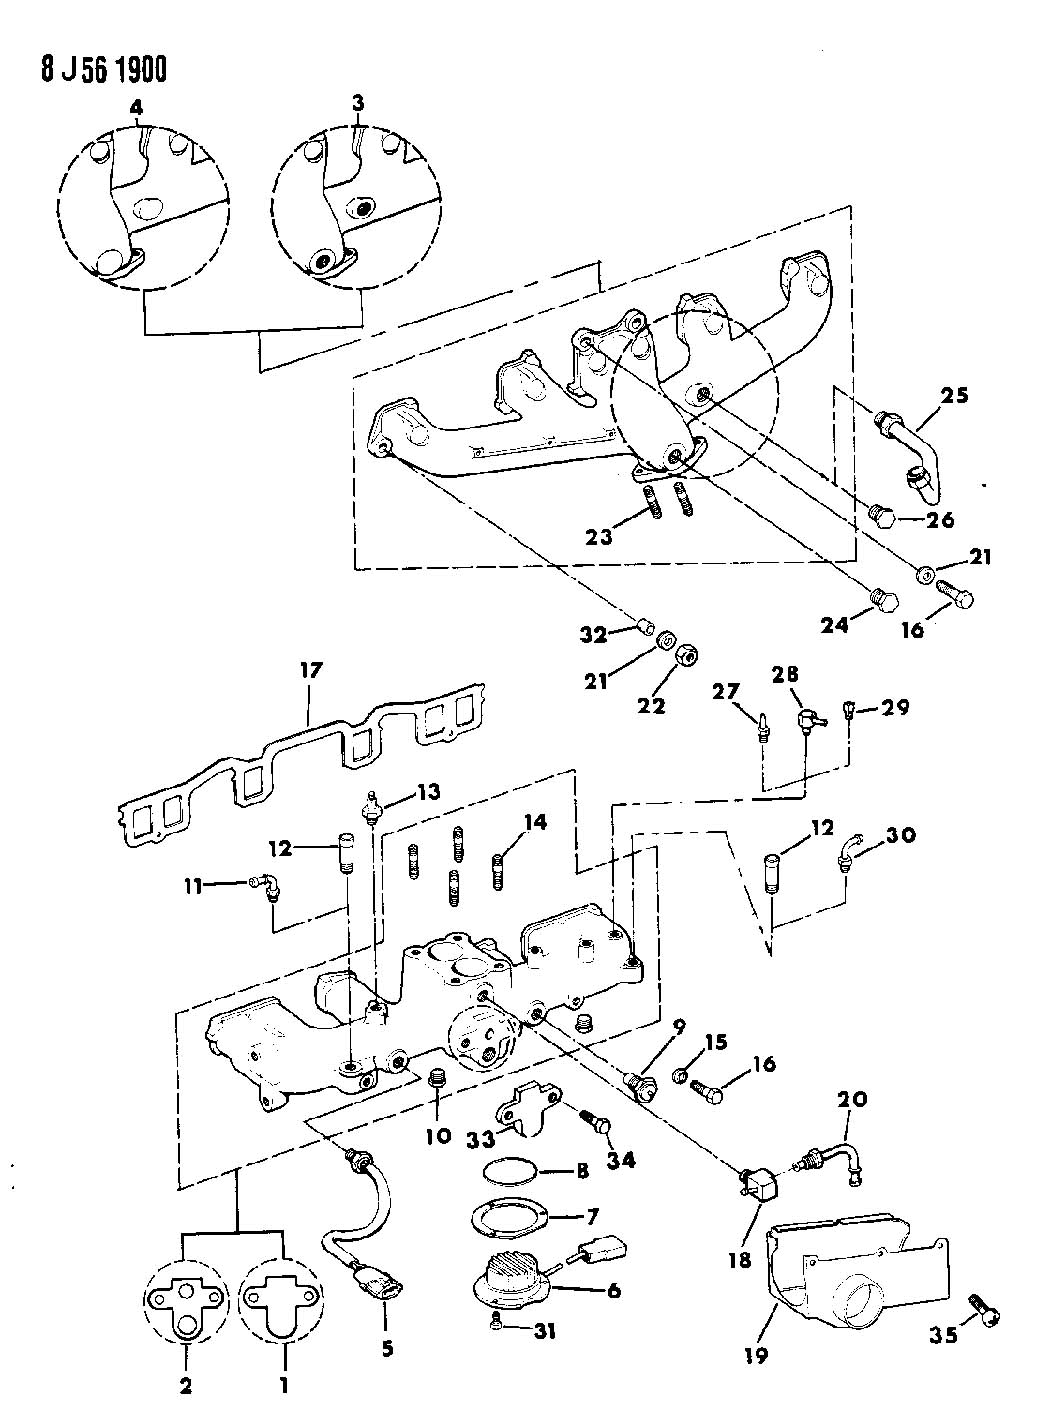 2004 jeep liberty parts diagram car tuning